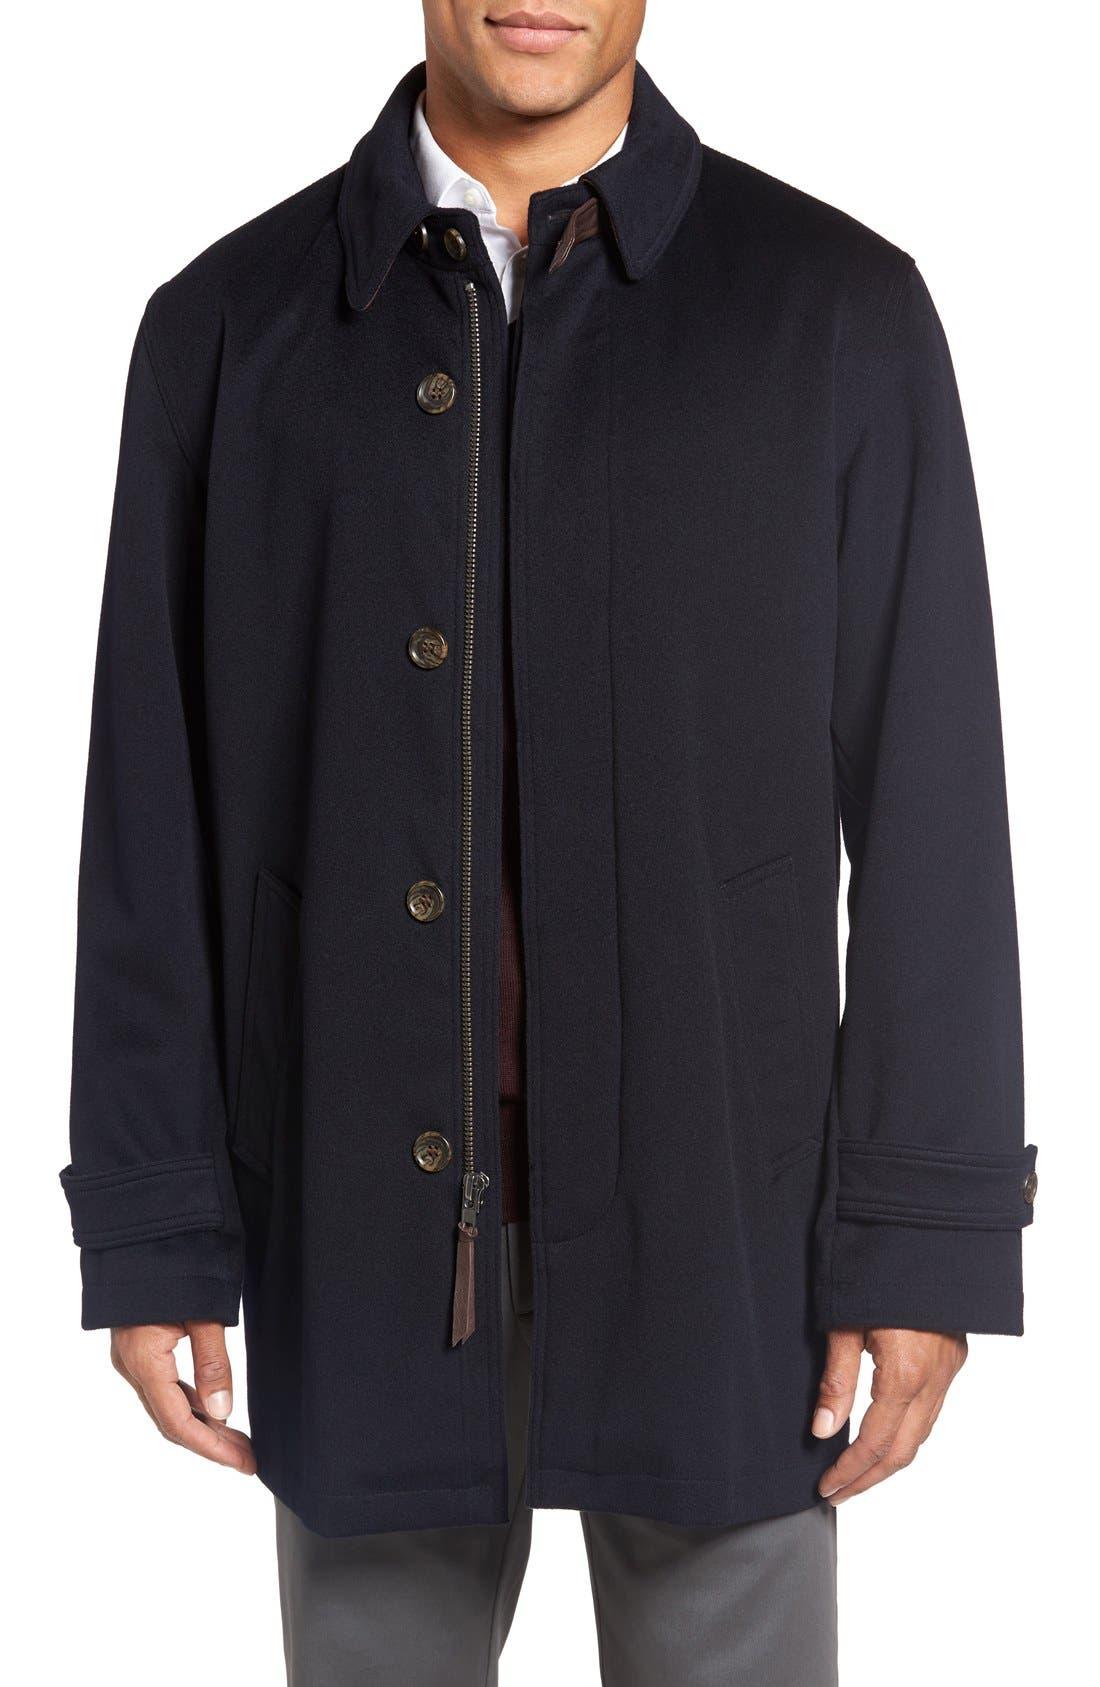 Main Image - Golden Bear Wool Overcoat